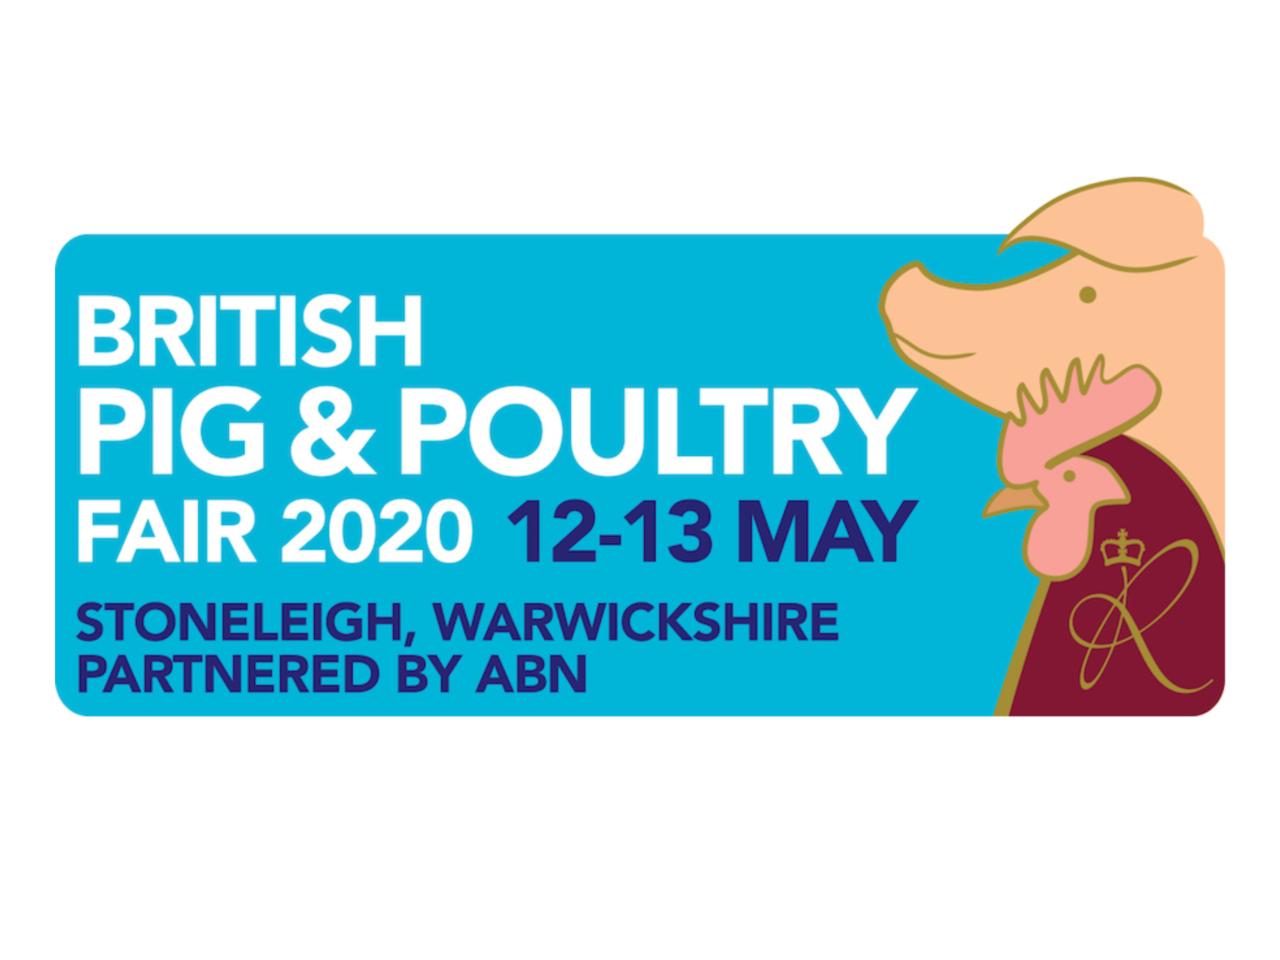 British Pig & Poultry Fair 2020